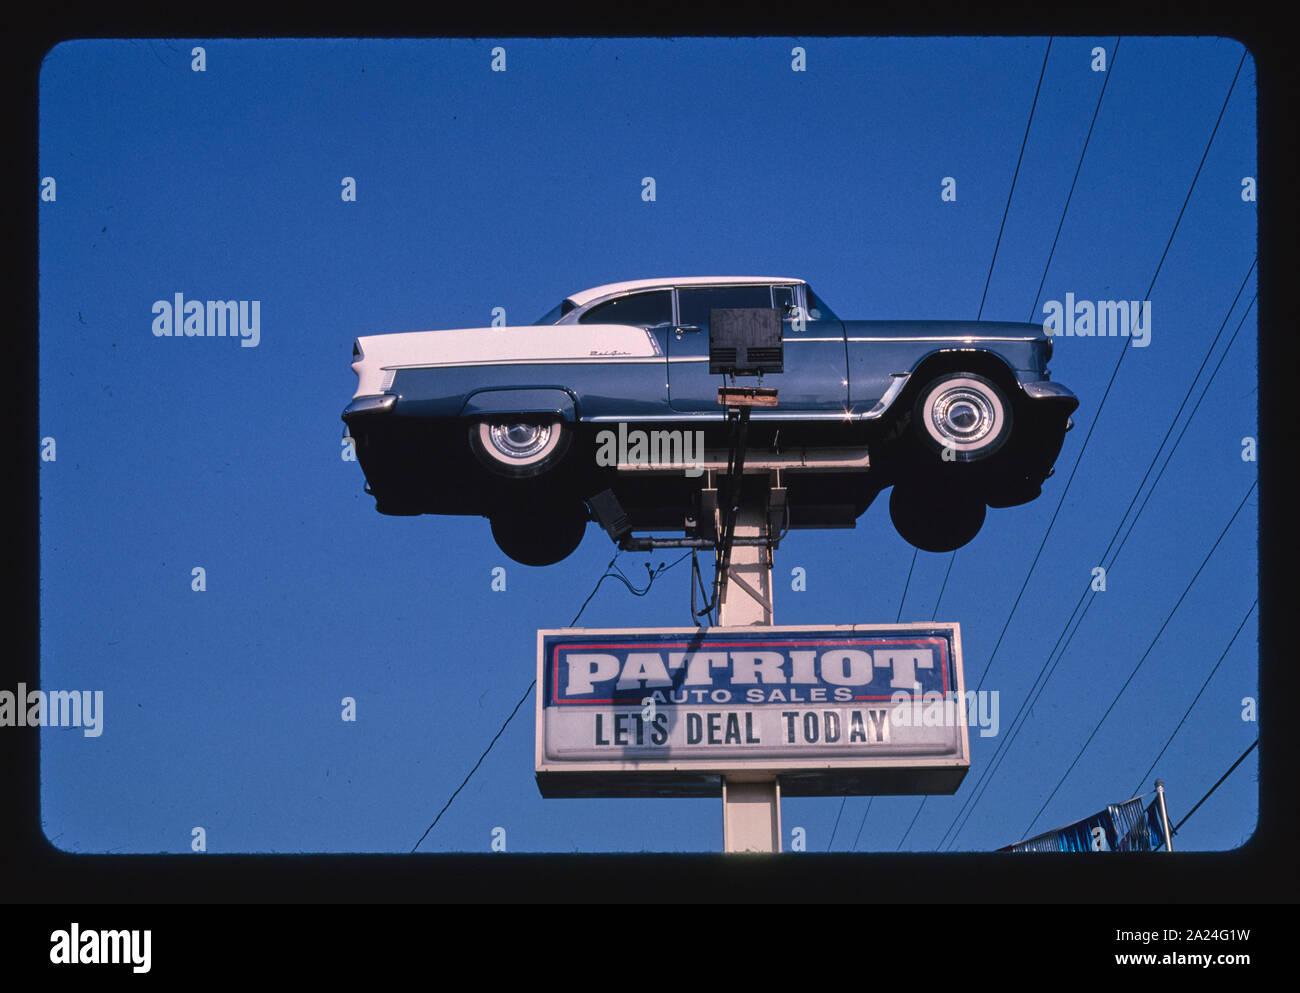 Patriot Auto Sales >> Patriot Auto Sales Sign Clearlake Street Springfield